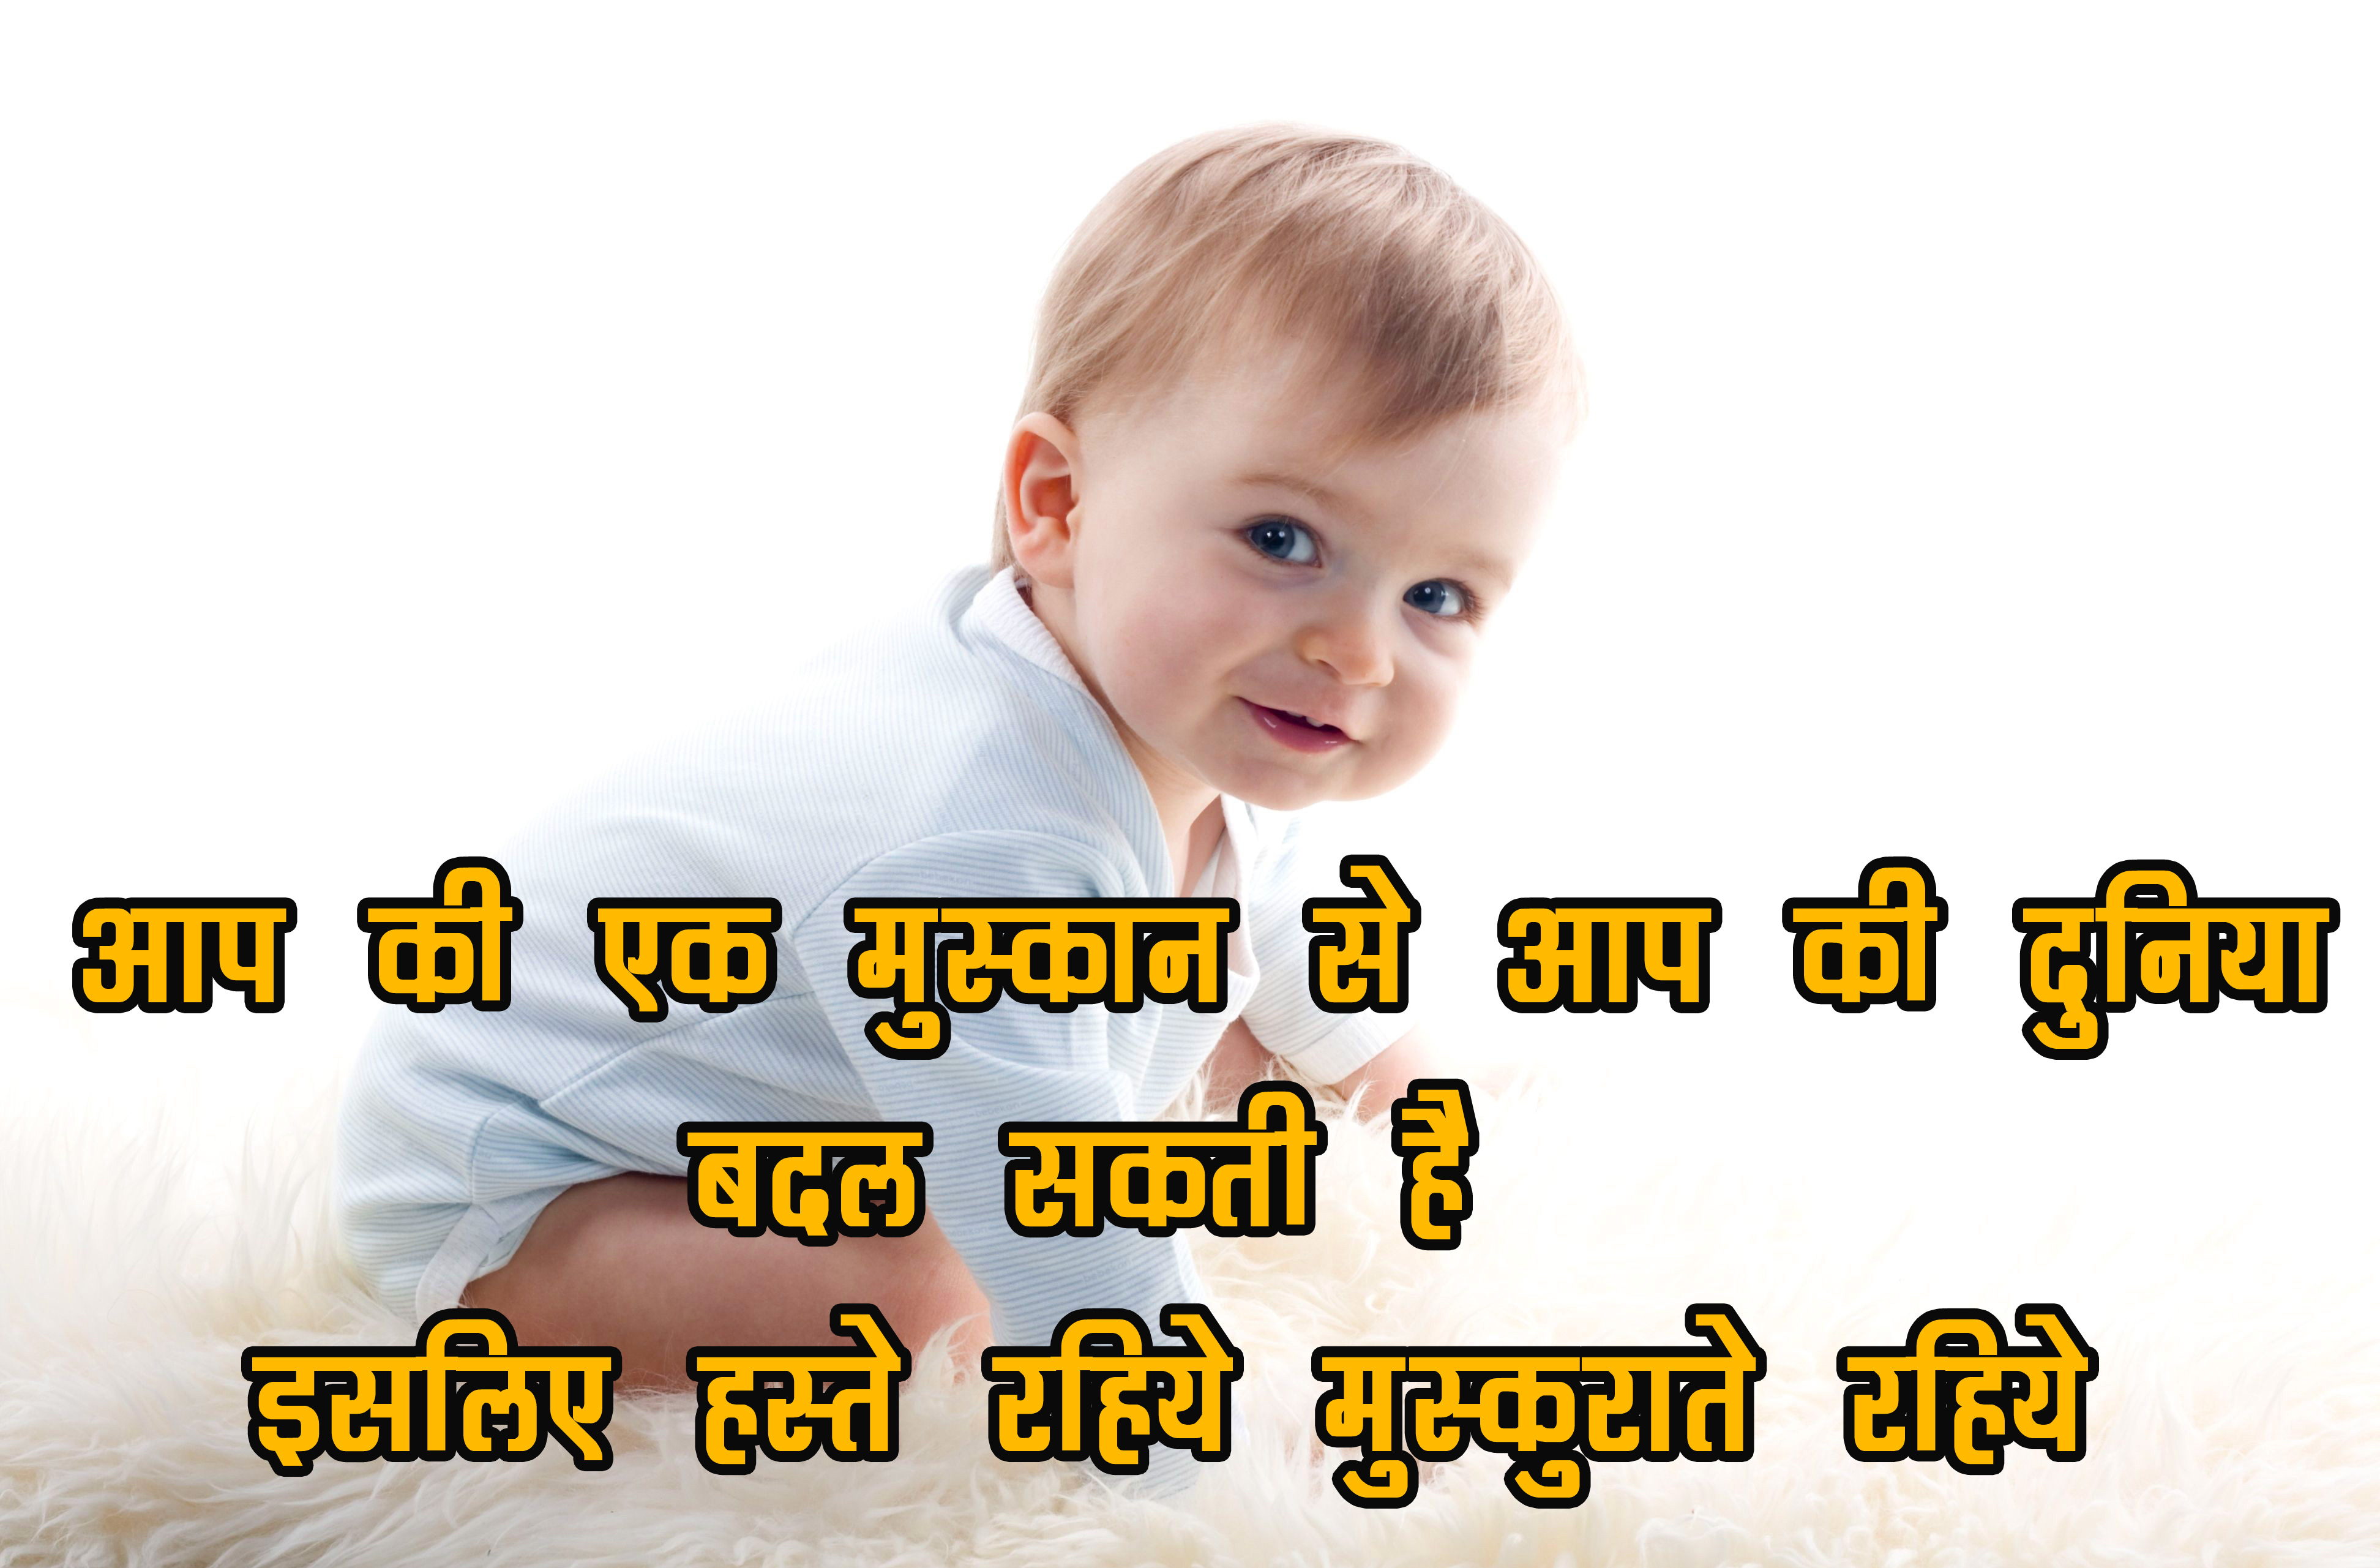 Hindi Whatsapp DP Status Profile Wallpaper Pics Free Download